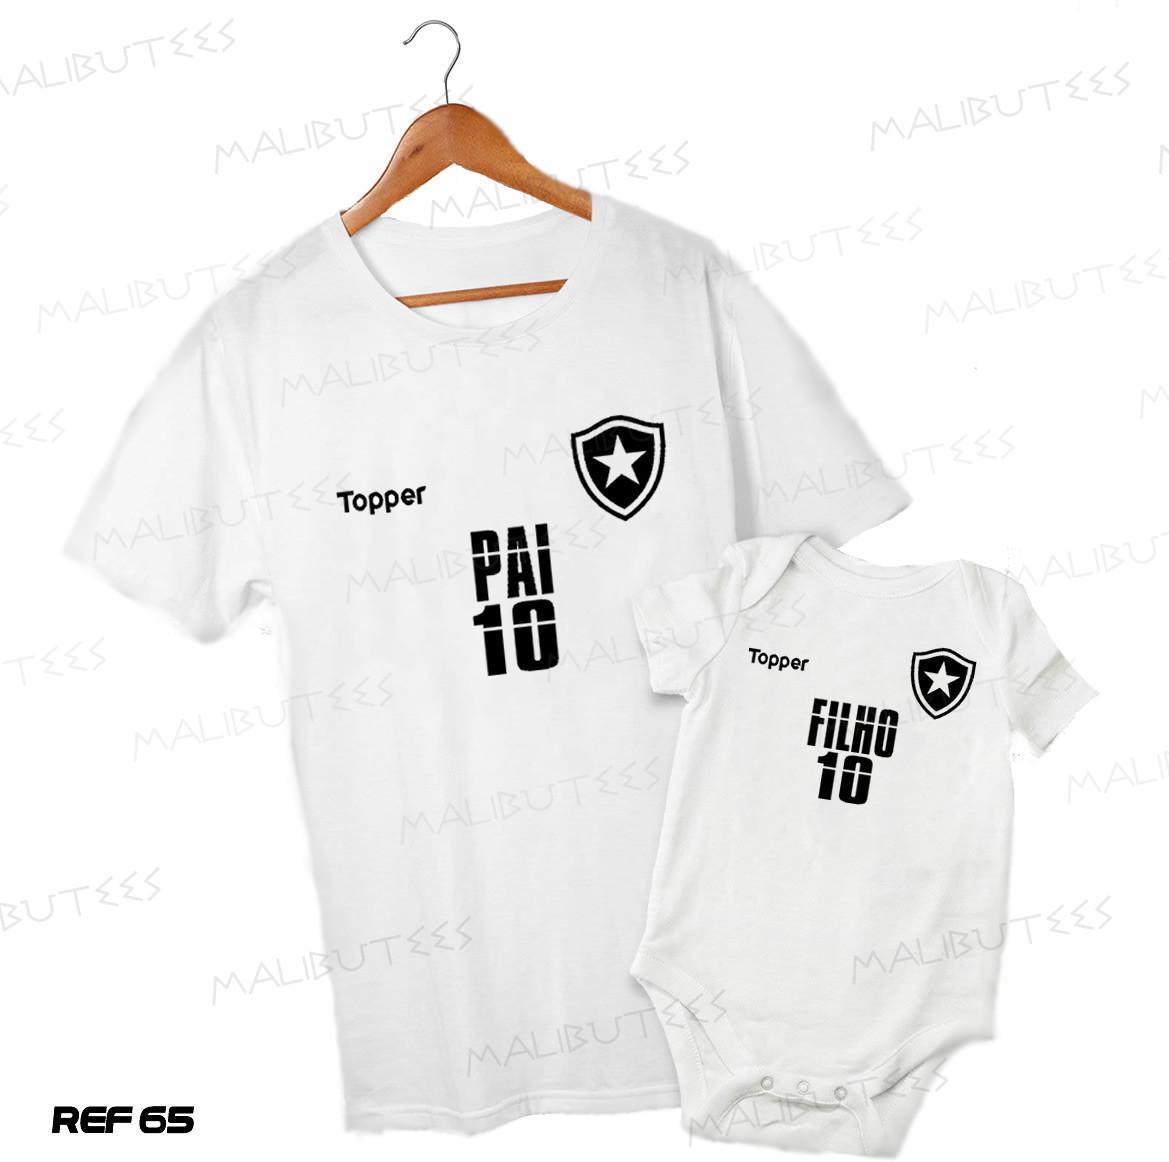 kit Botafogo Tal Pai   Tal Filho e Tal Mãe no Elo7  03598e5b4328f